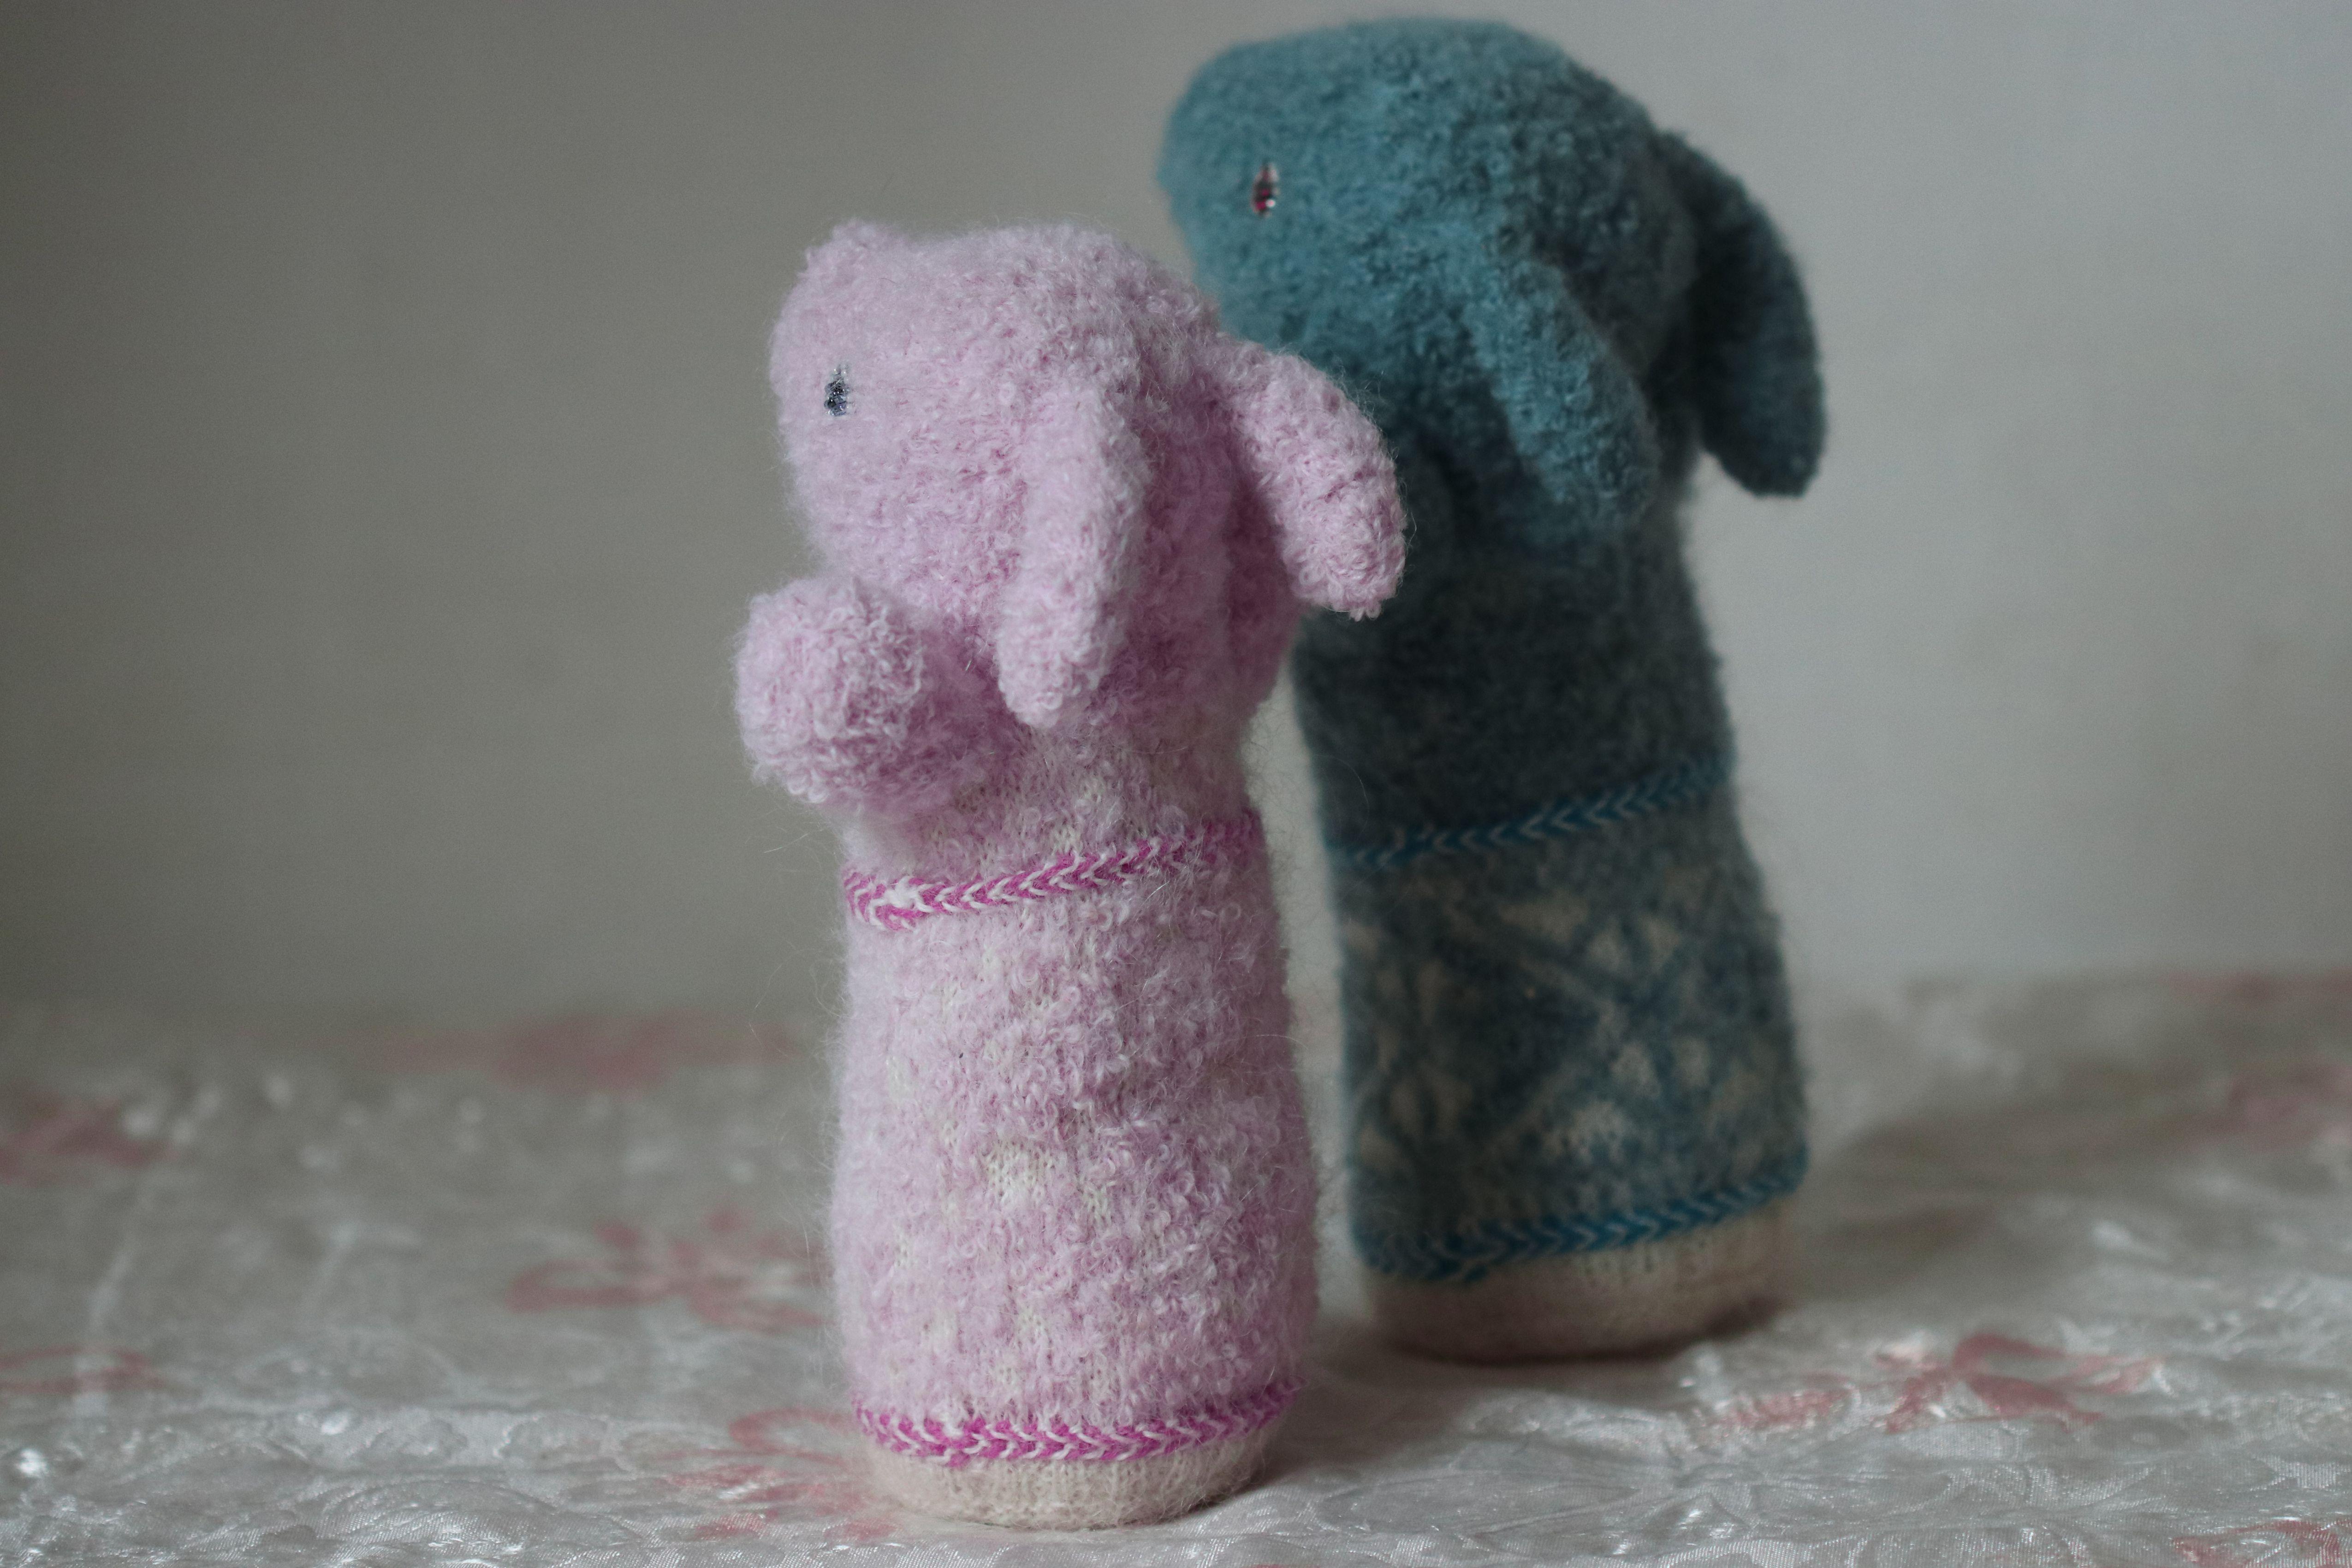 baby toy gift rabbit art beads bunny animal plush stuffed pink collectible fiber fluffy twin